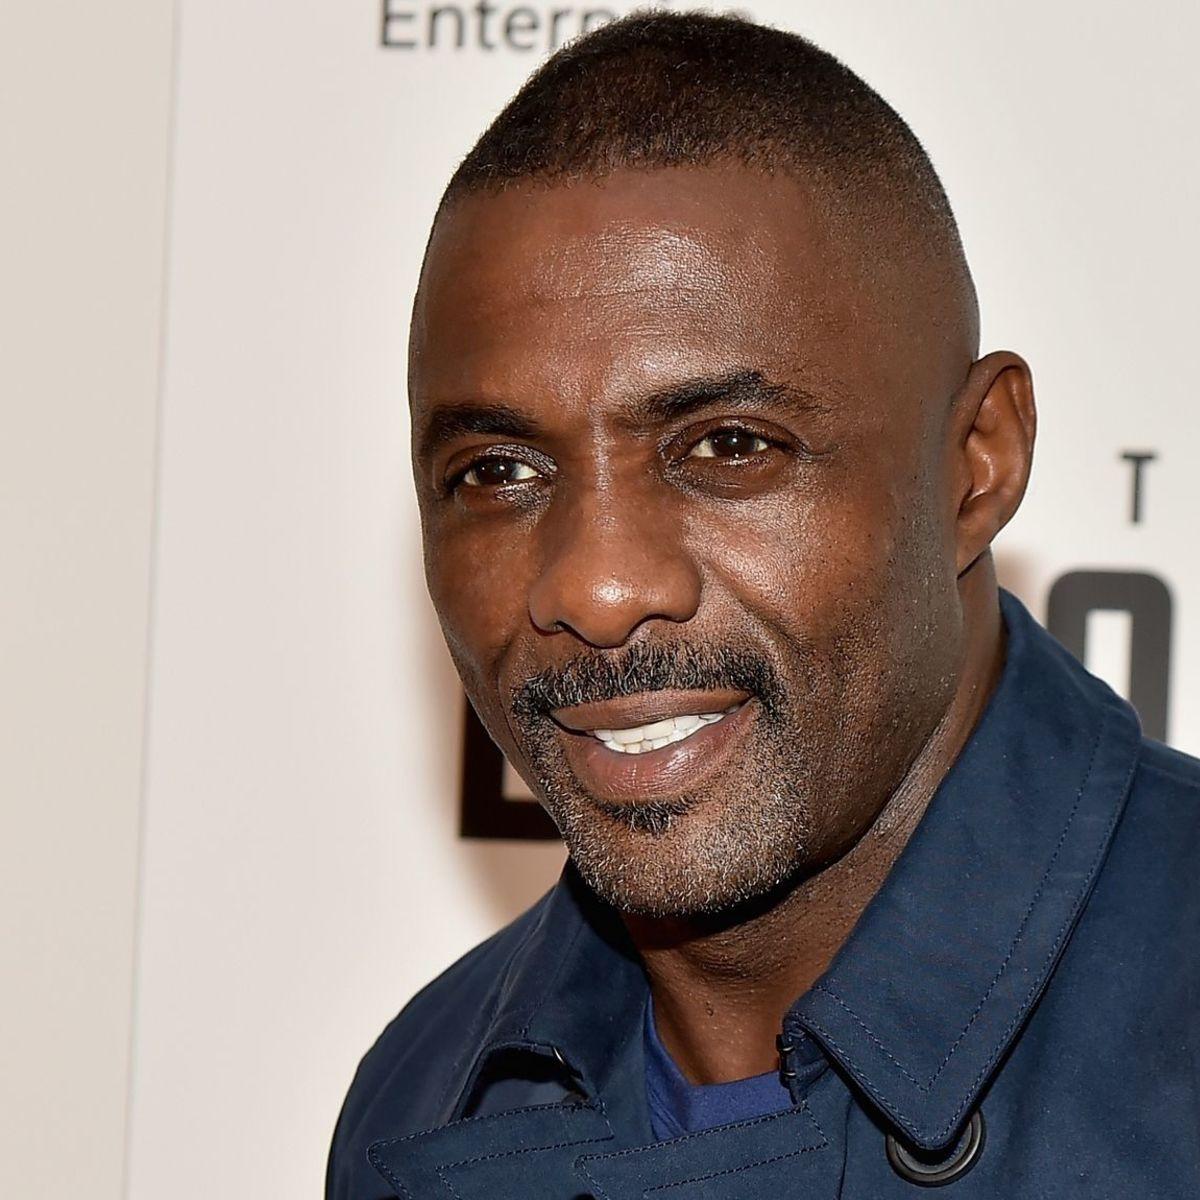 New Poll Idris Elba Is The Fan Favorite To Replace Daniel